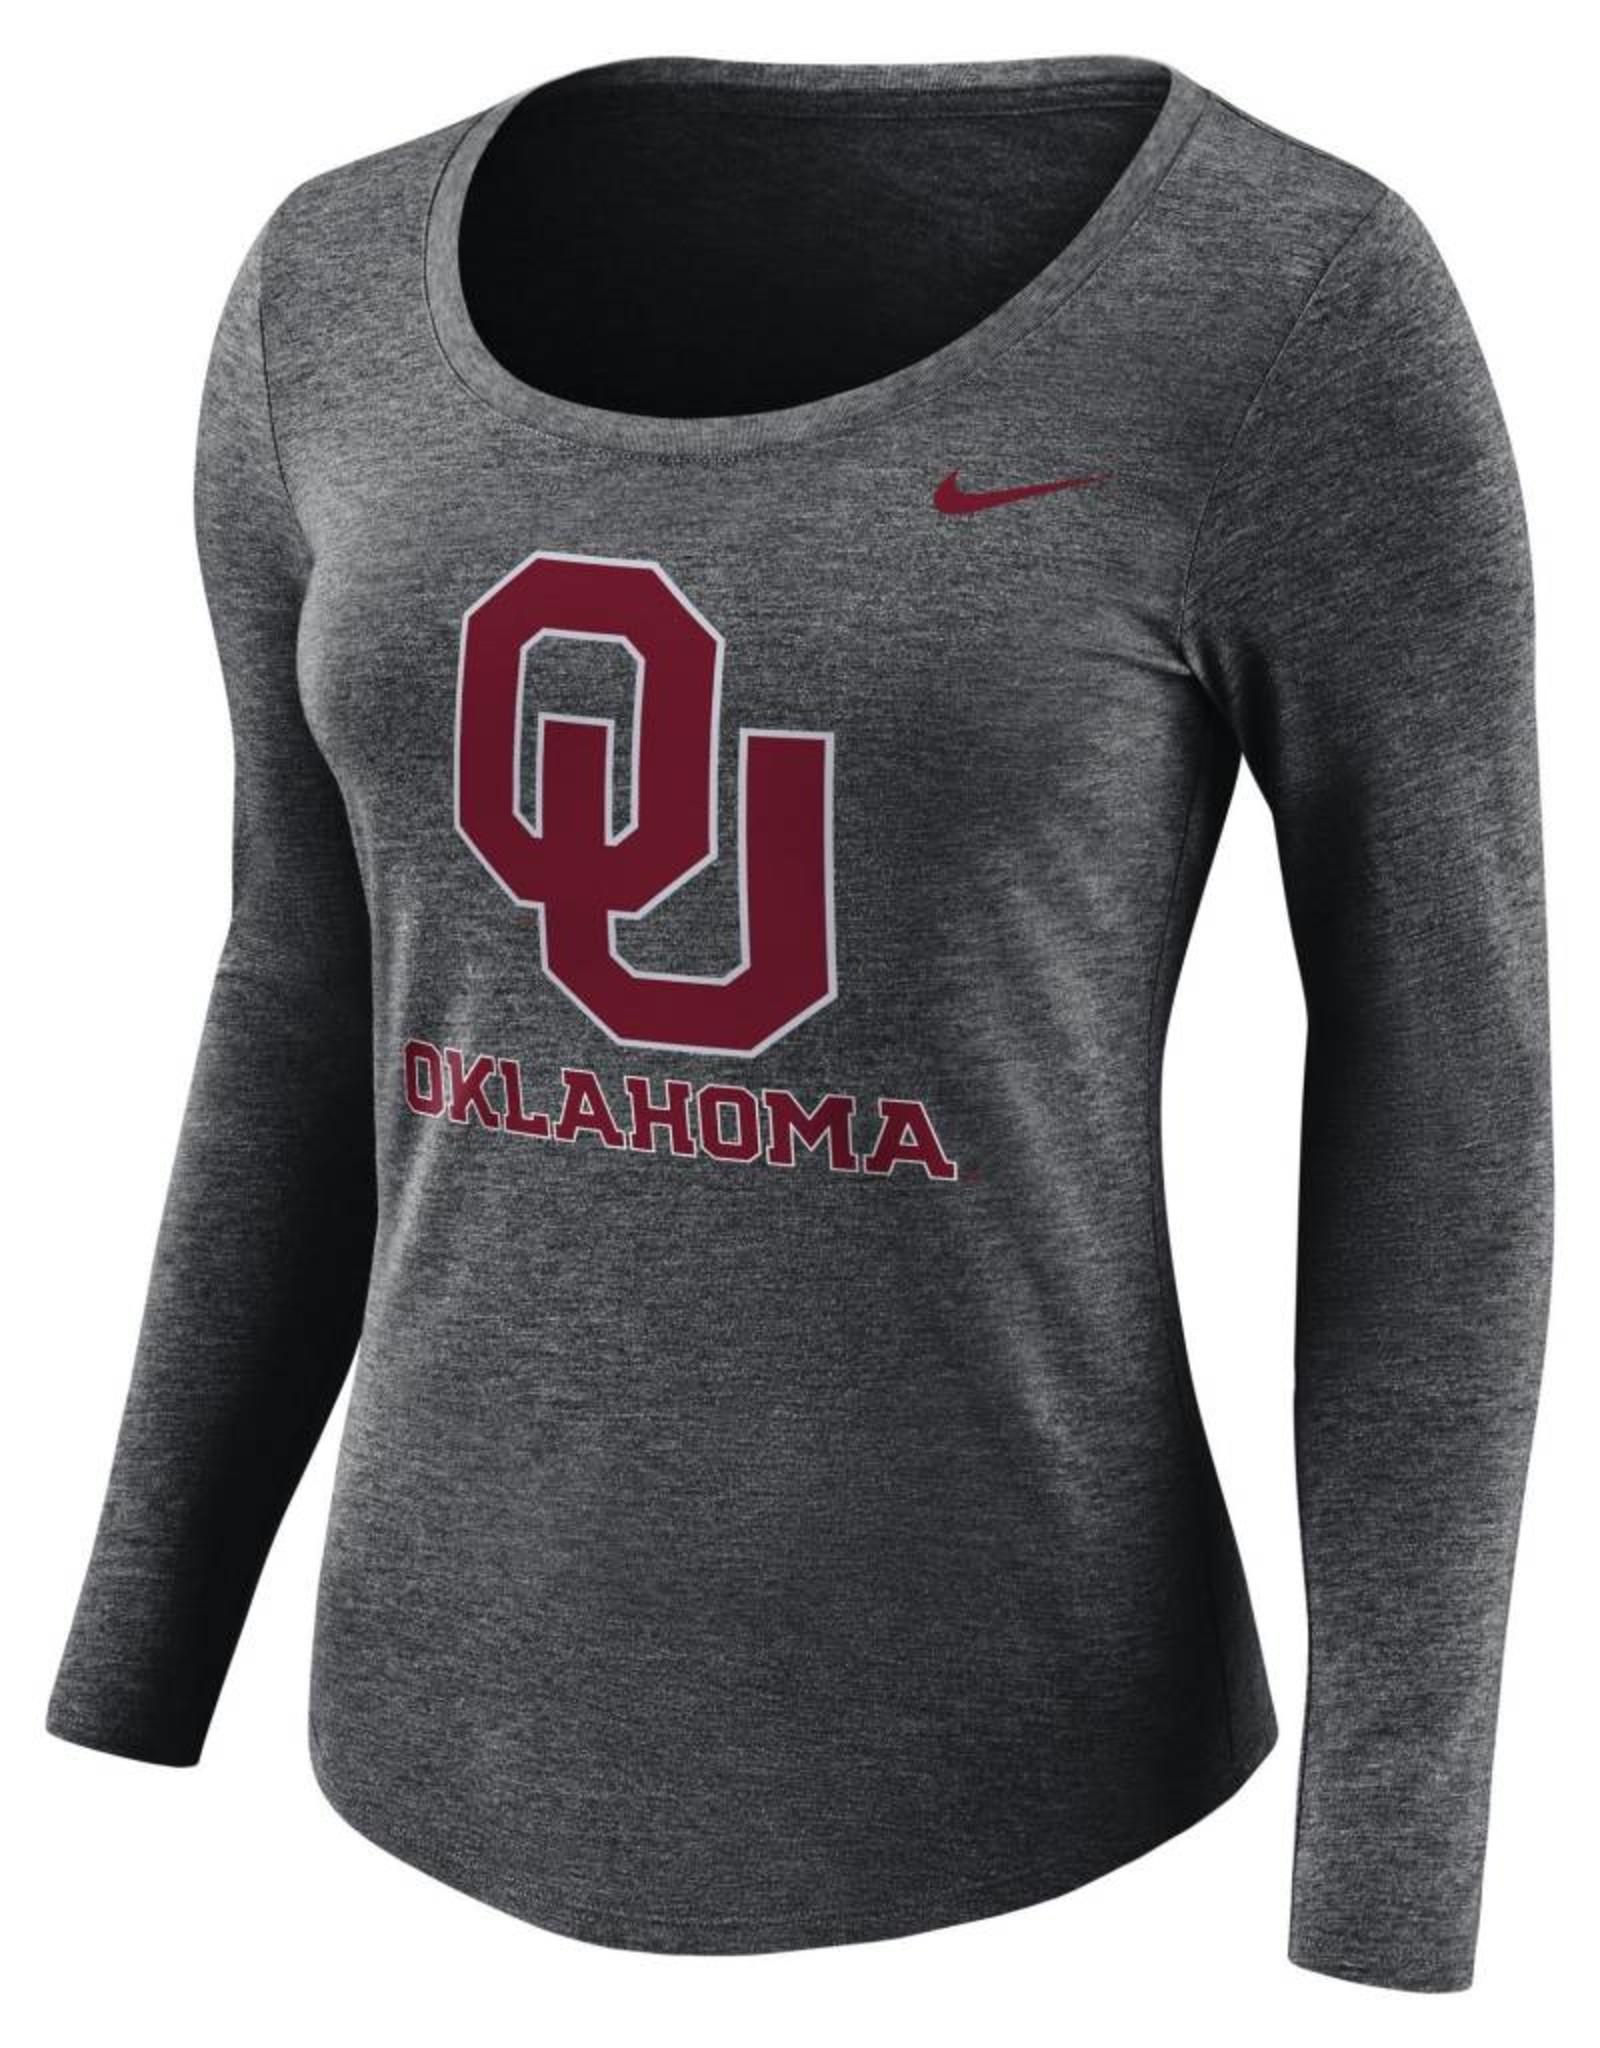 Nike Women's Nike Long Sleeve Logo Tee Charcoal Hthr.